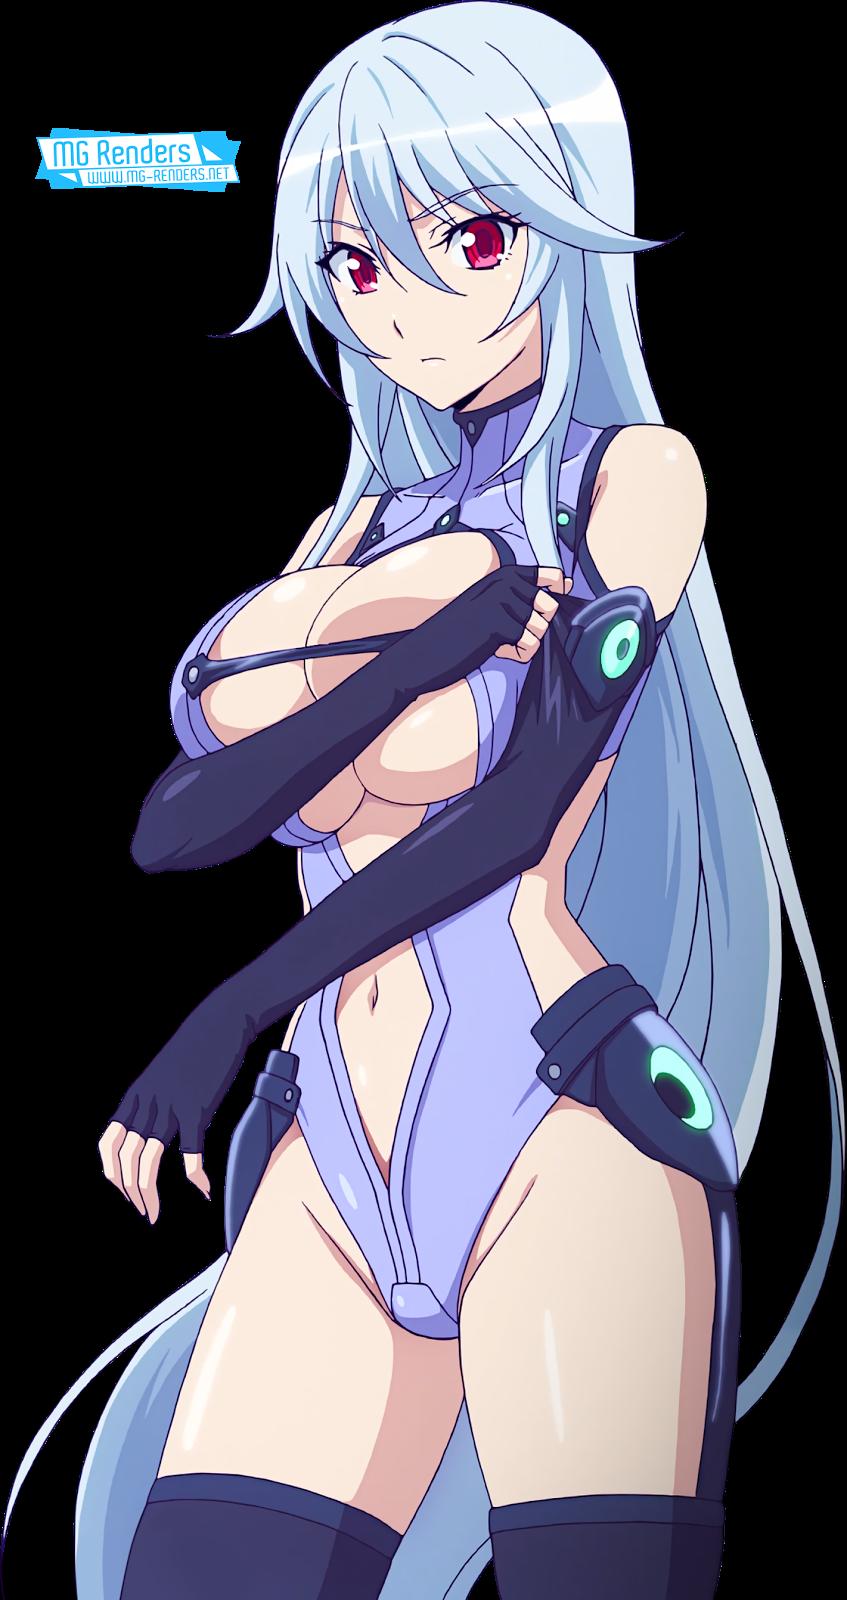 Tags: Anime, Render,  Bodysuit,  Chidorigafuchi Aine,  Huge Breasts,  Masou Gakuen HxH,  PNG, Image, Picture